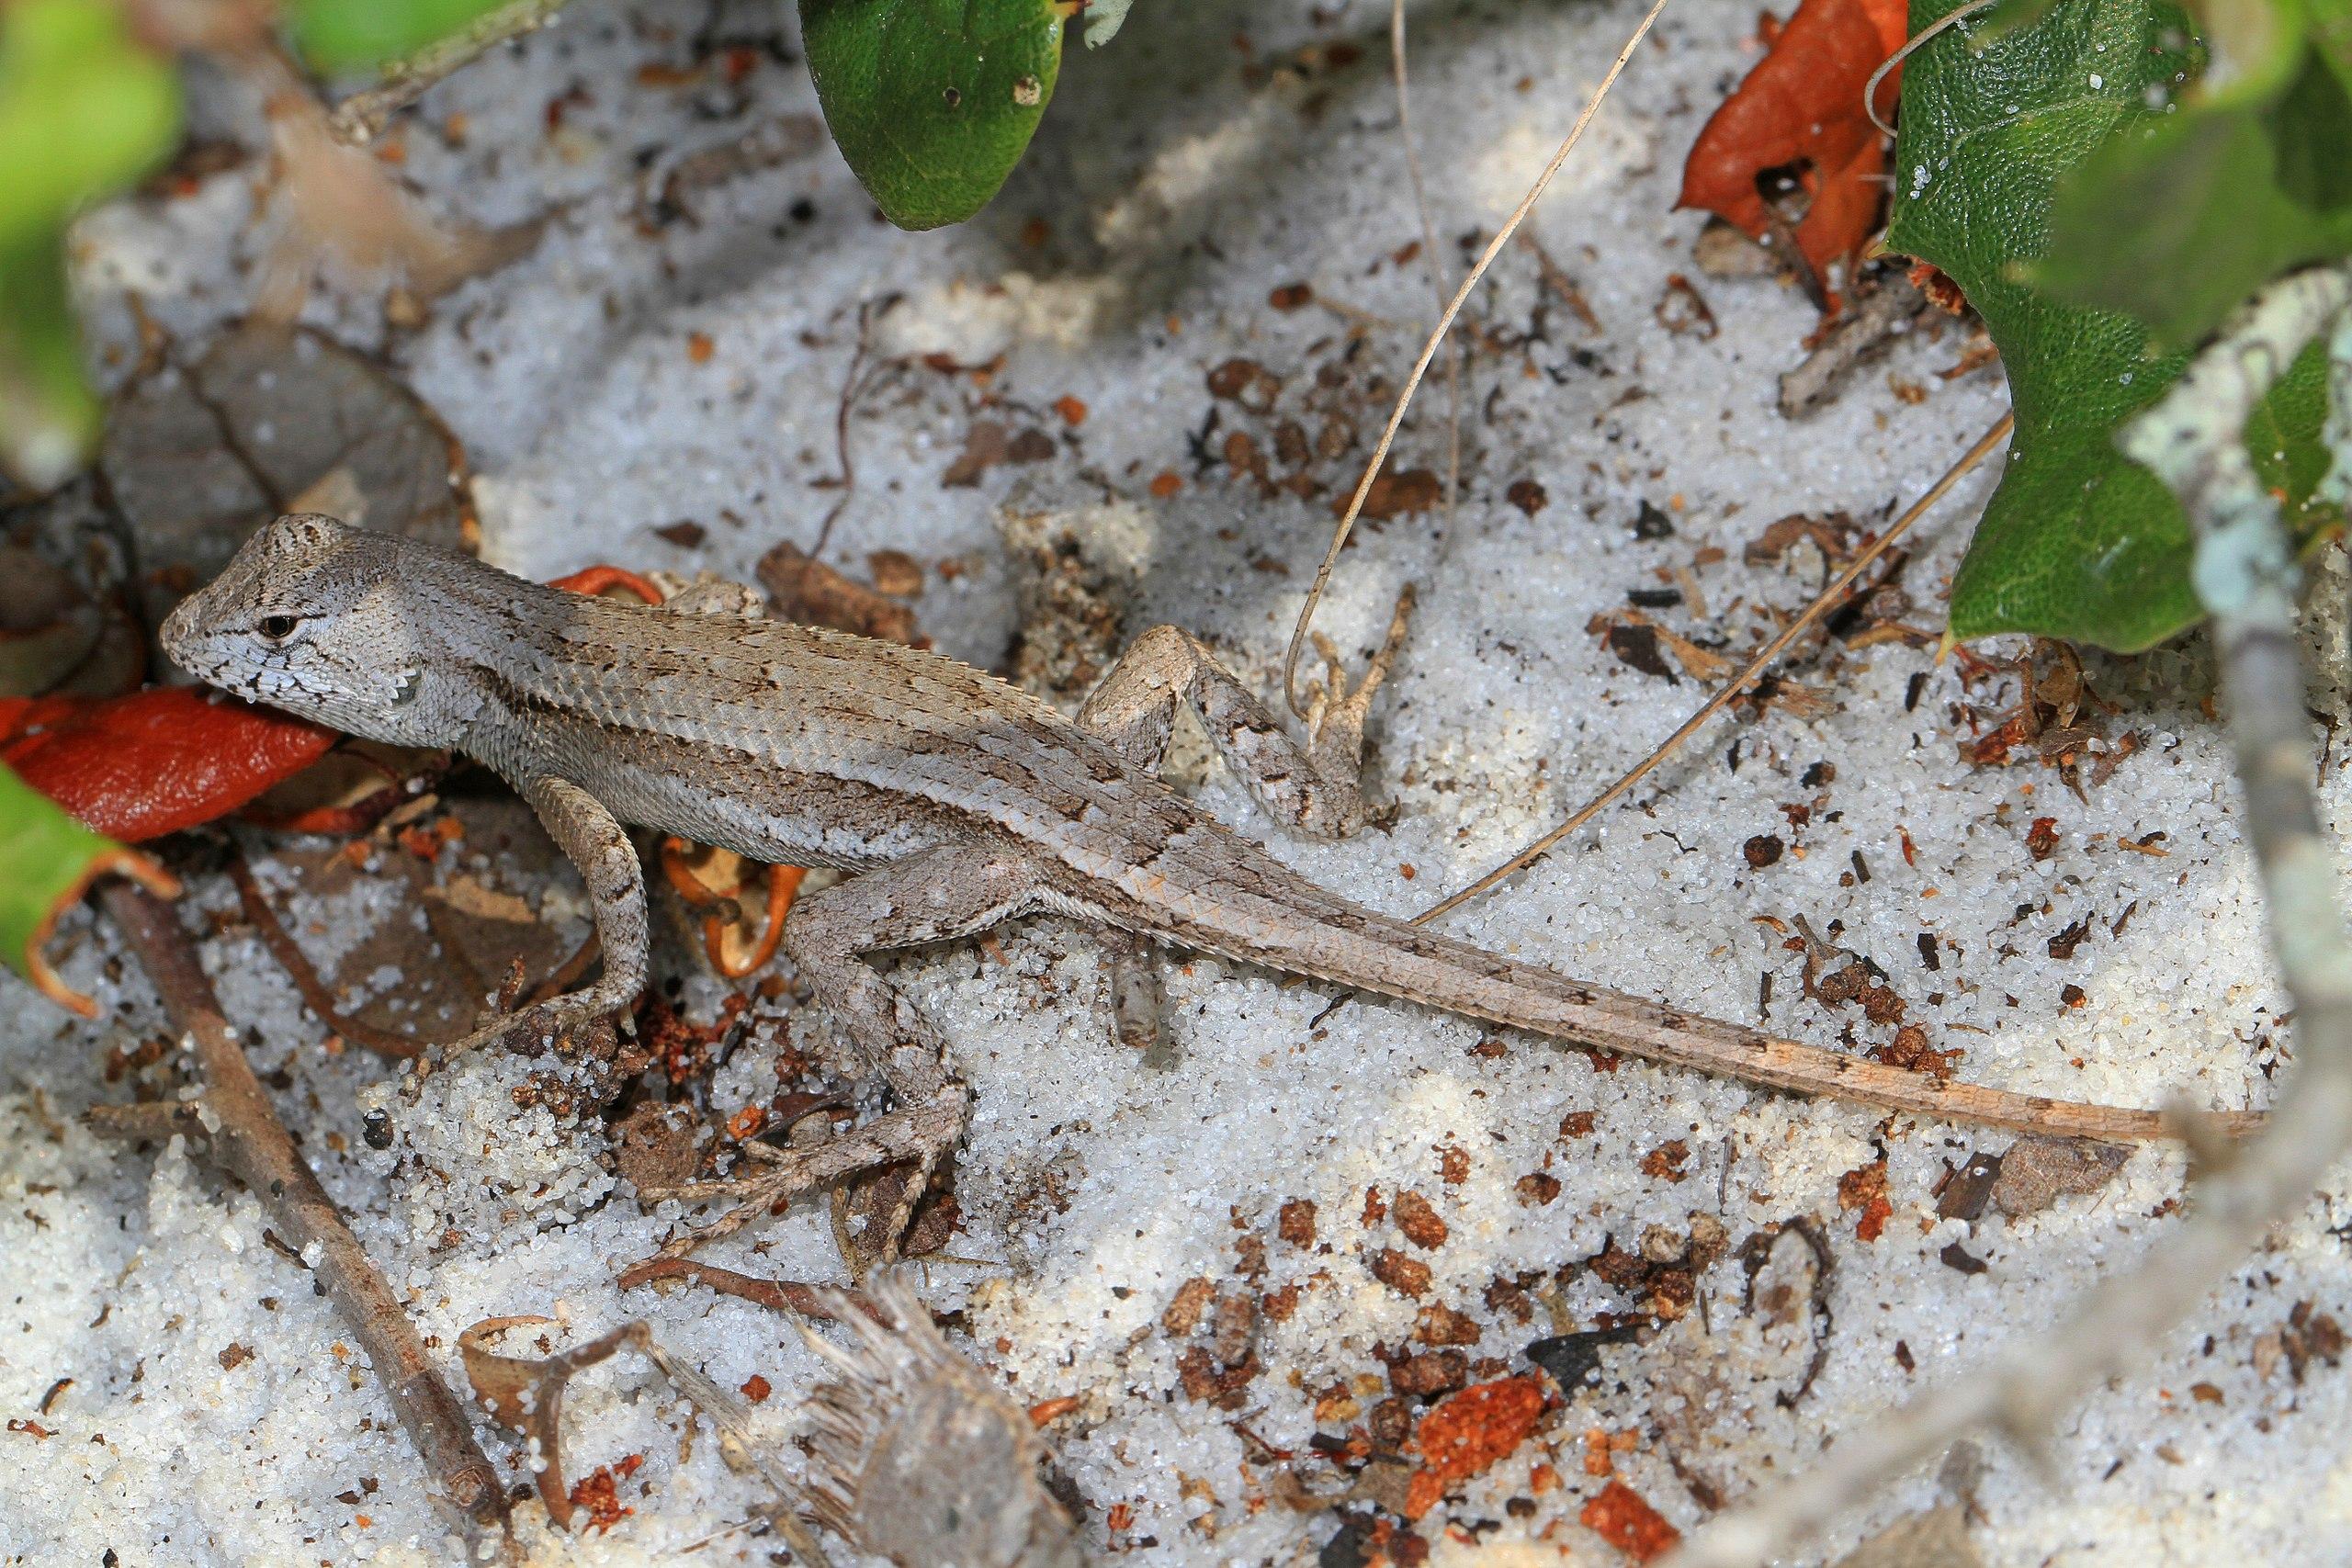 Florida Scrub Lizard (Sceloporus woodi)